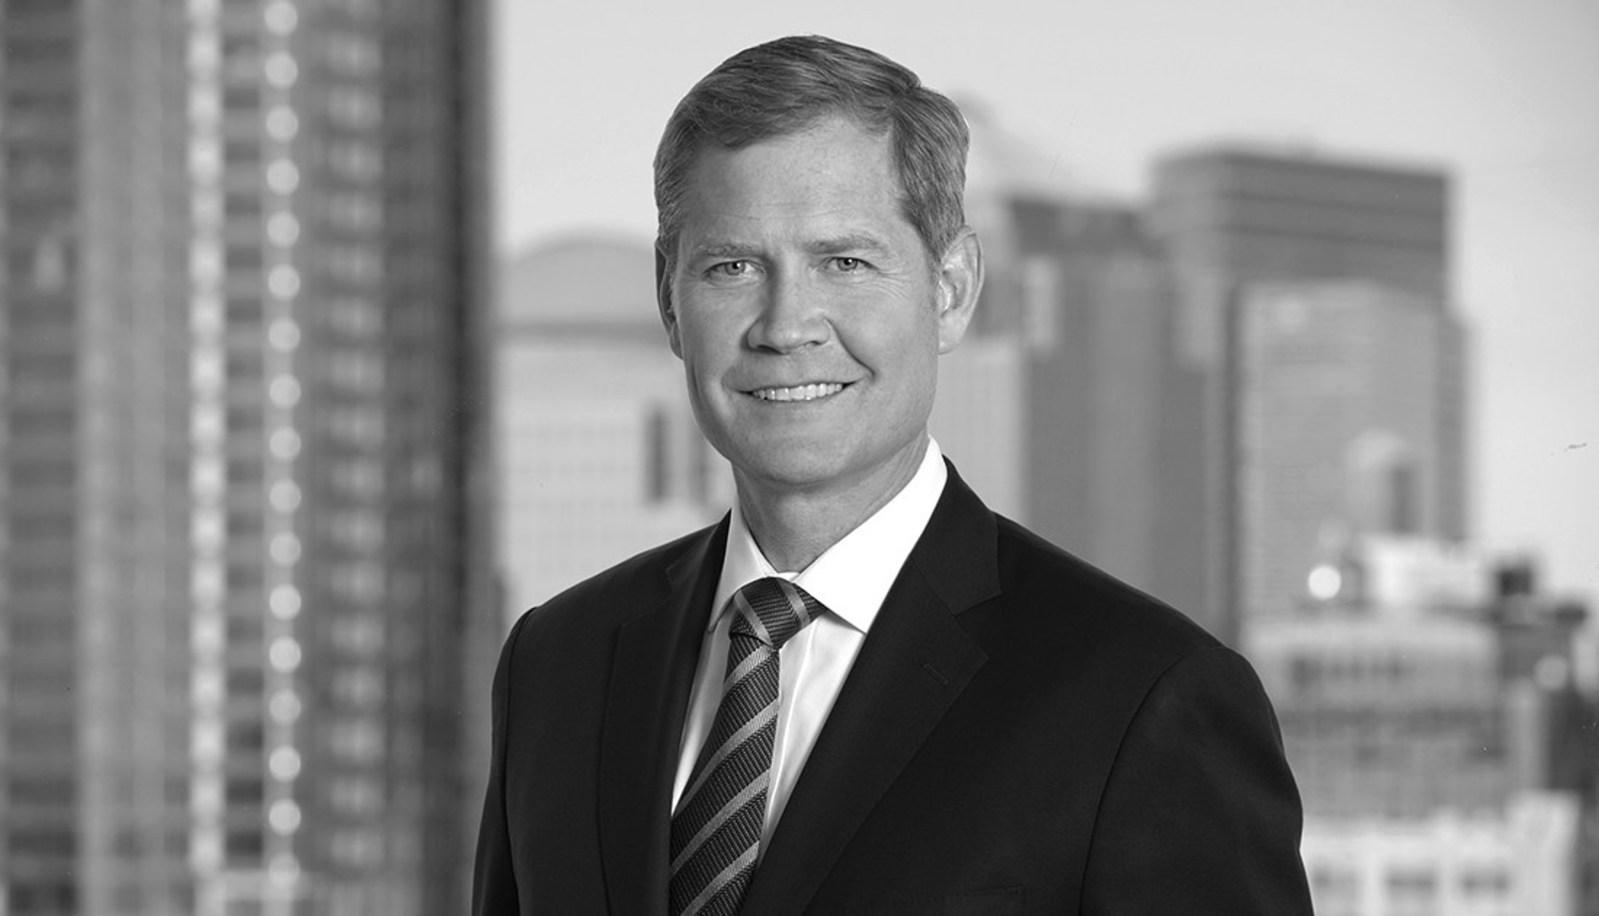 Former EDNY prosecutor joins Walden Macht & Haran